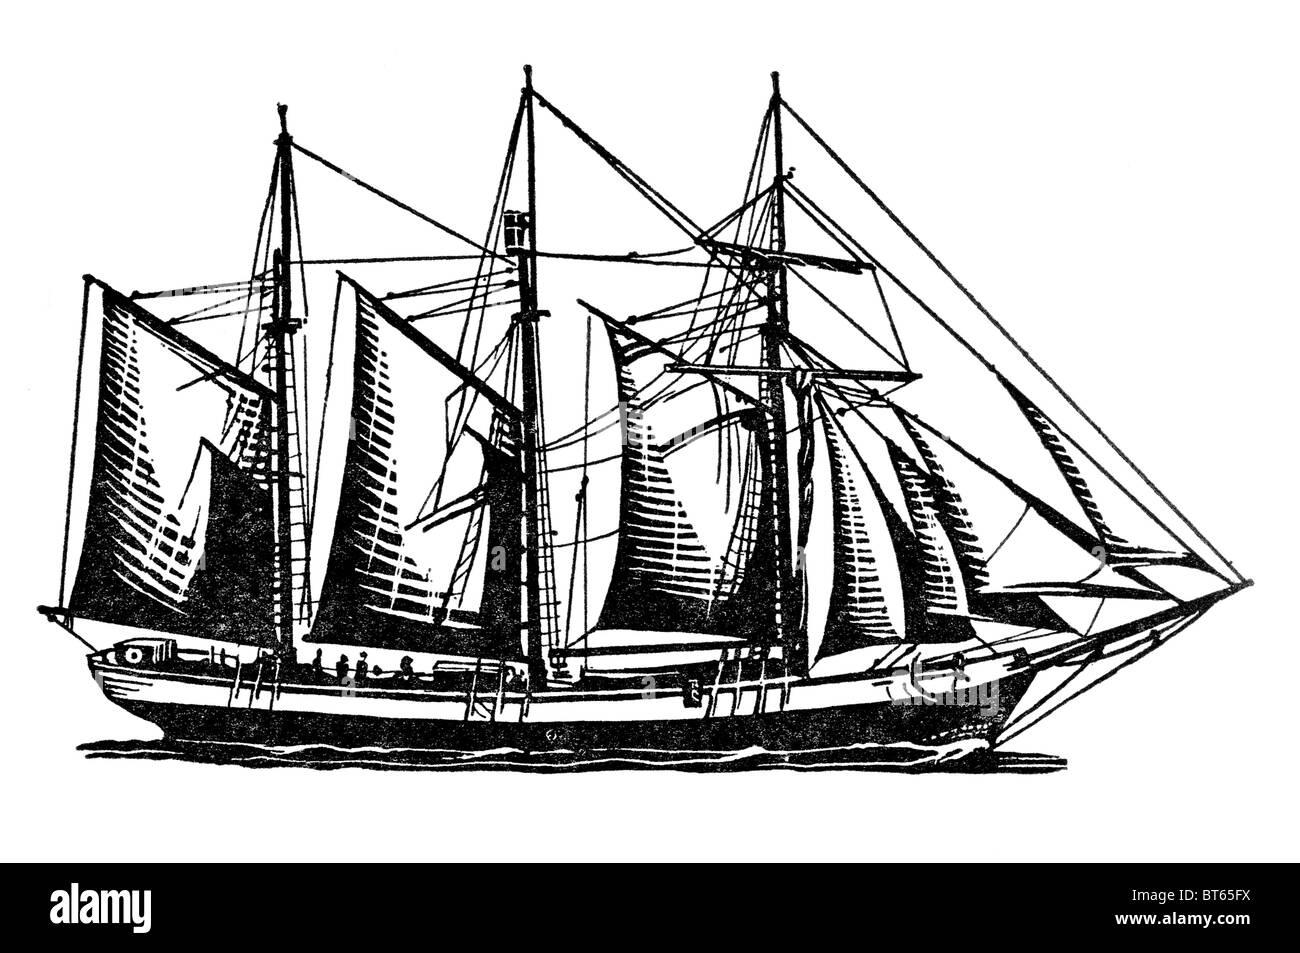 royal yacht penola sailing ship three 3 mast profile maritime ocean r y - Stock Image